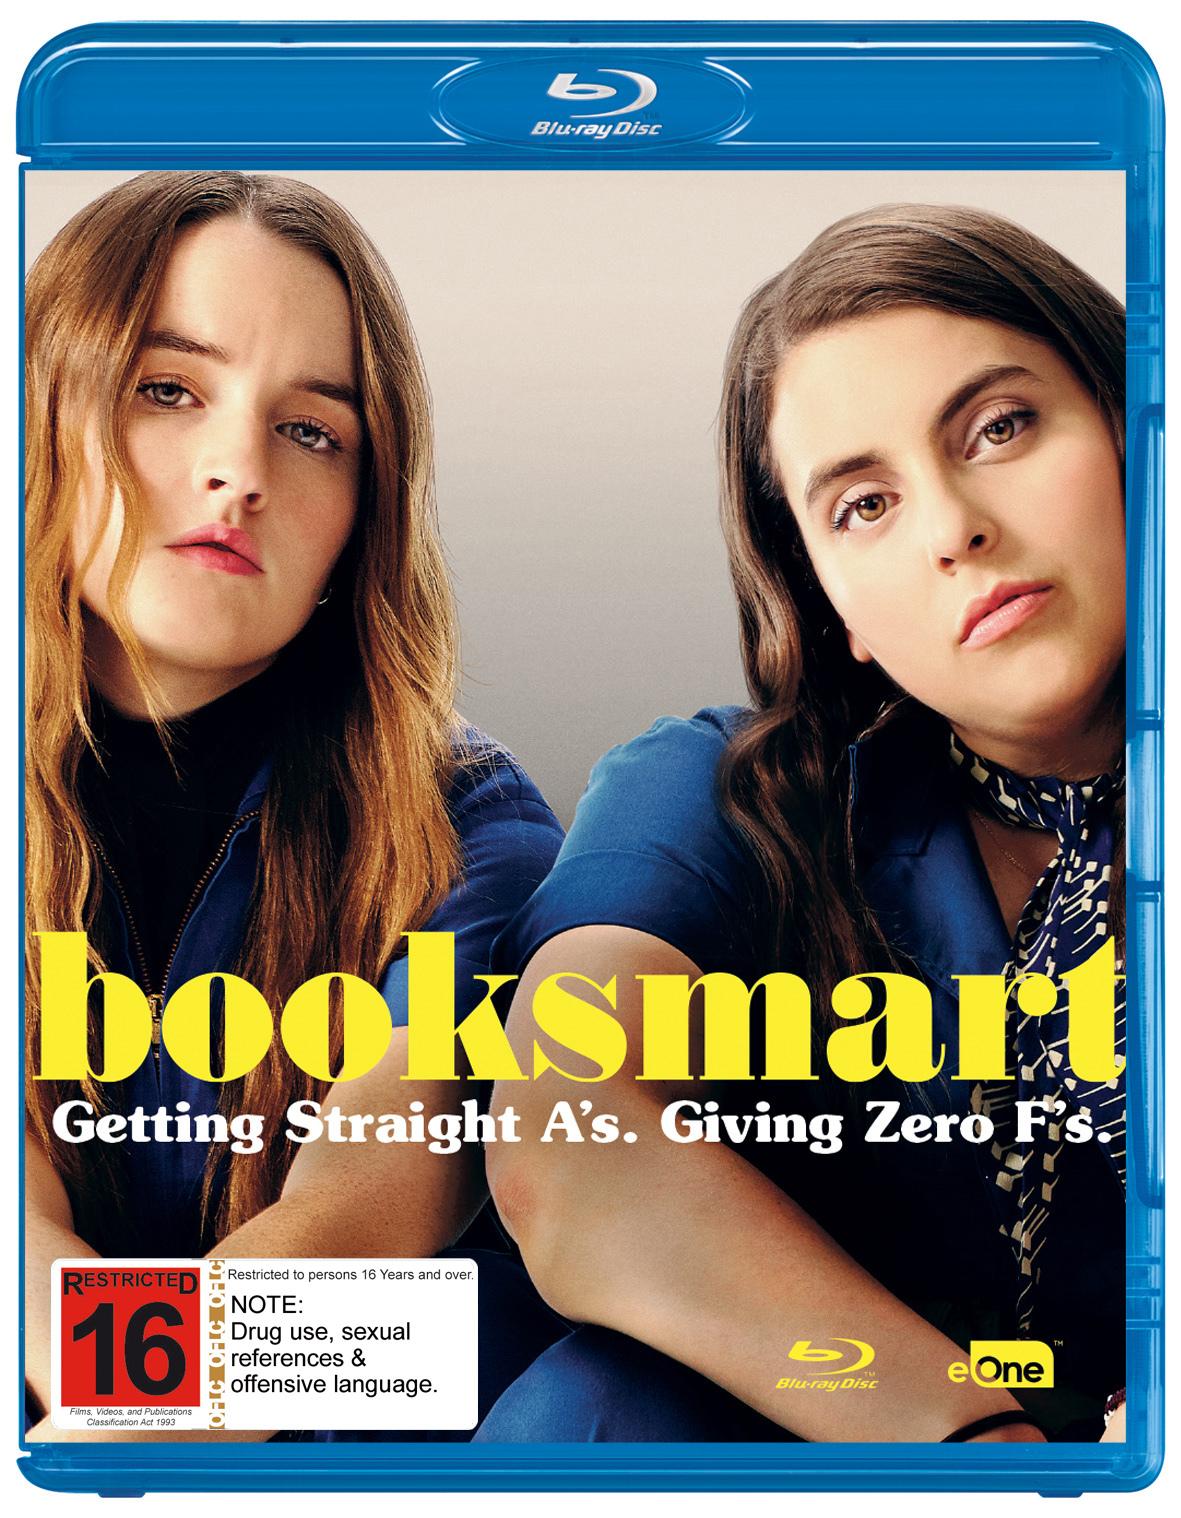 Booksmart on Blu-ray image